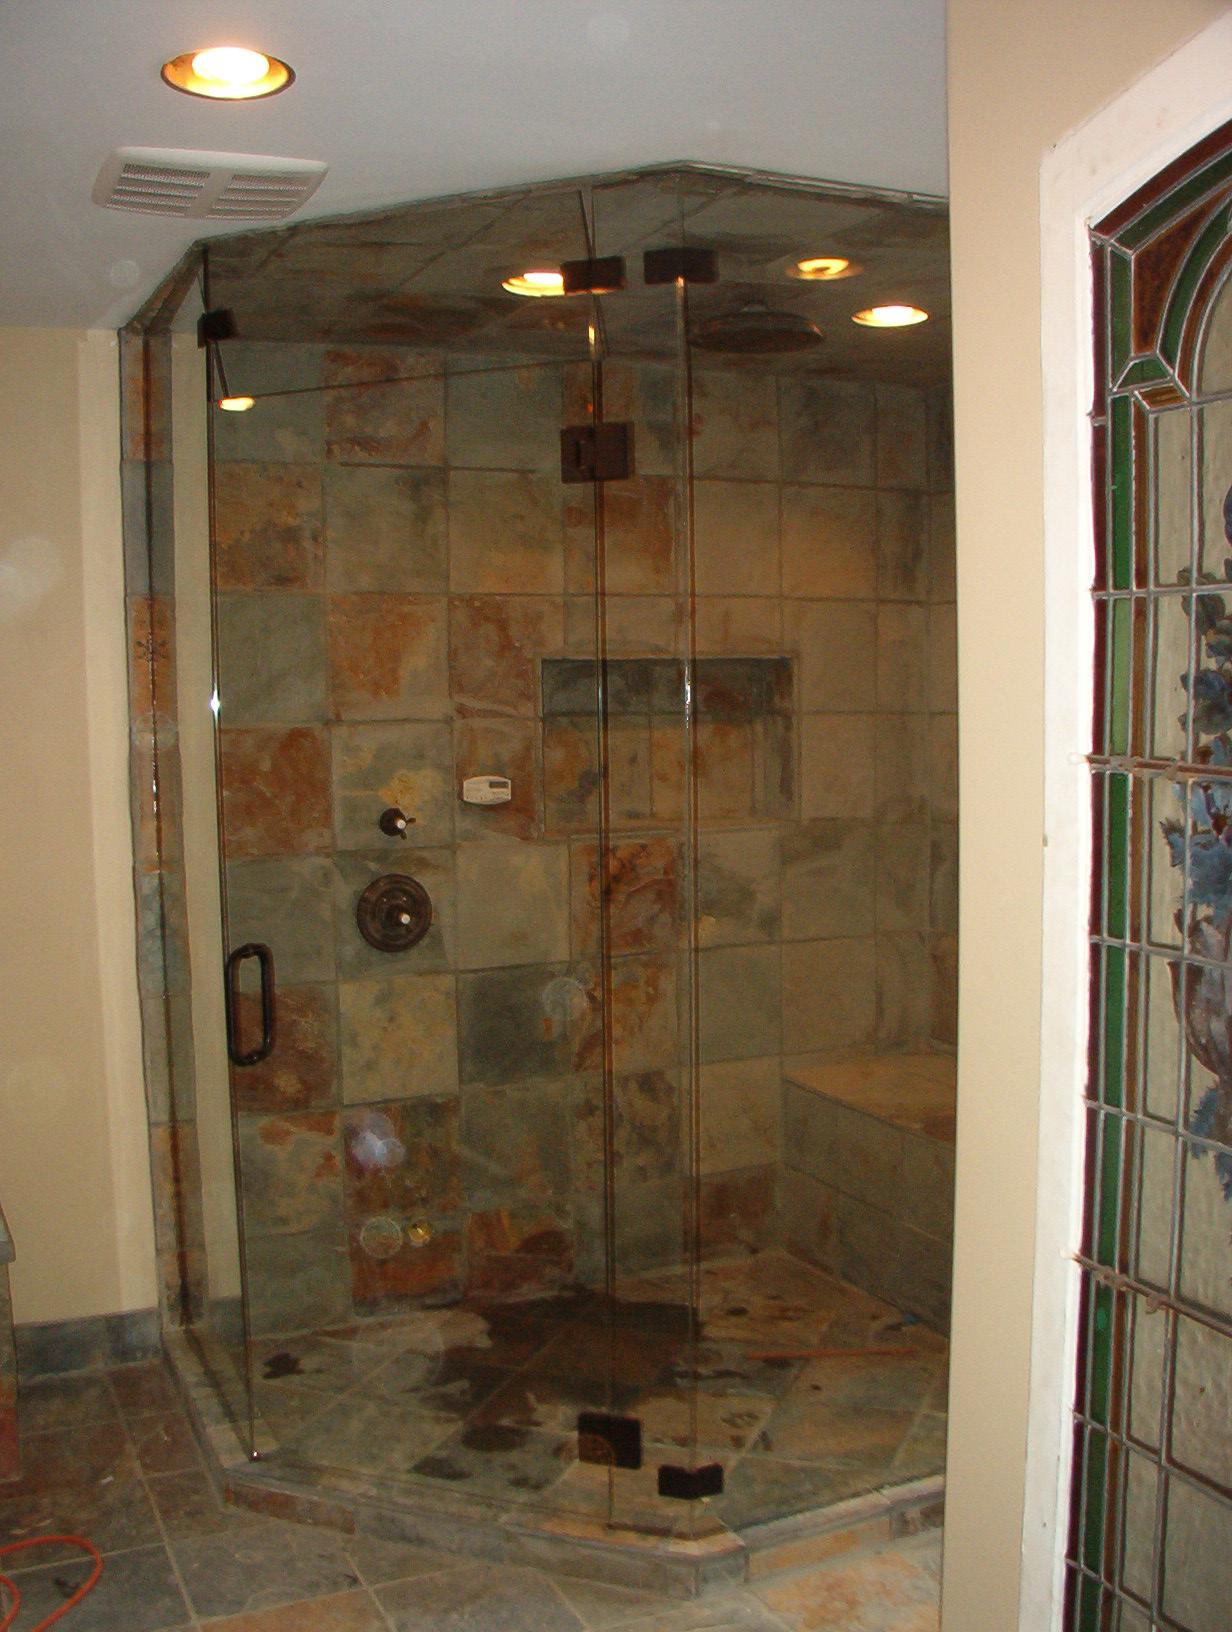 Tanner Glass & Hardware Showers - Tanner Glass & Hardware